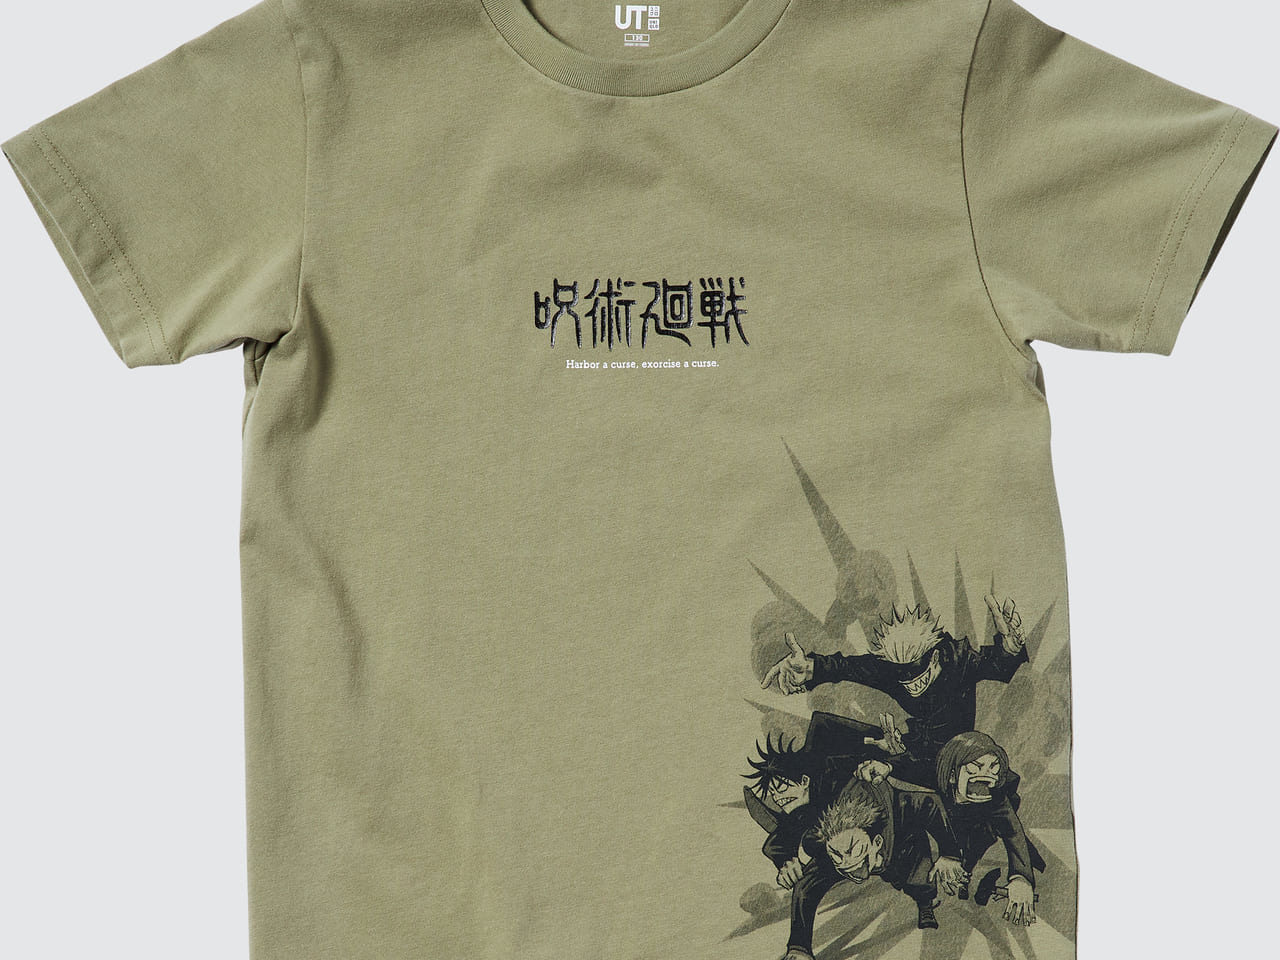 呪術廻戦UT